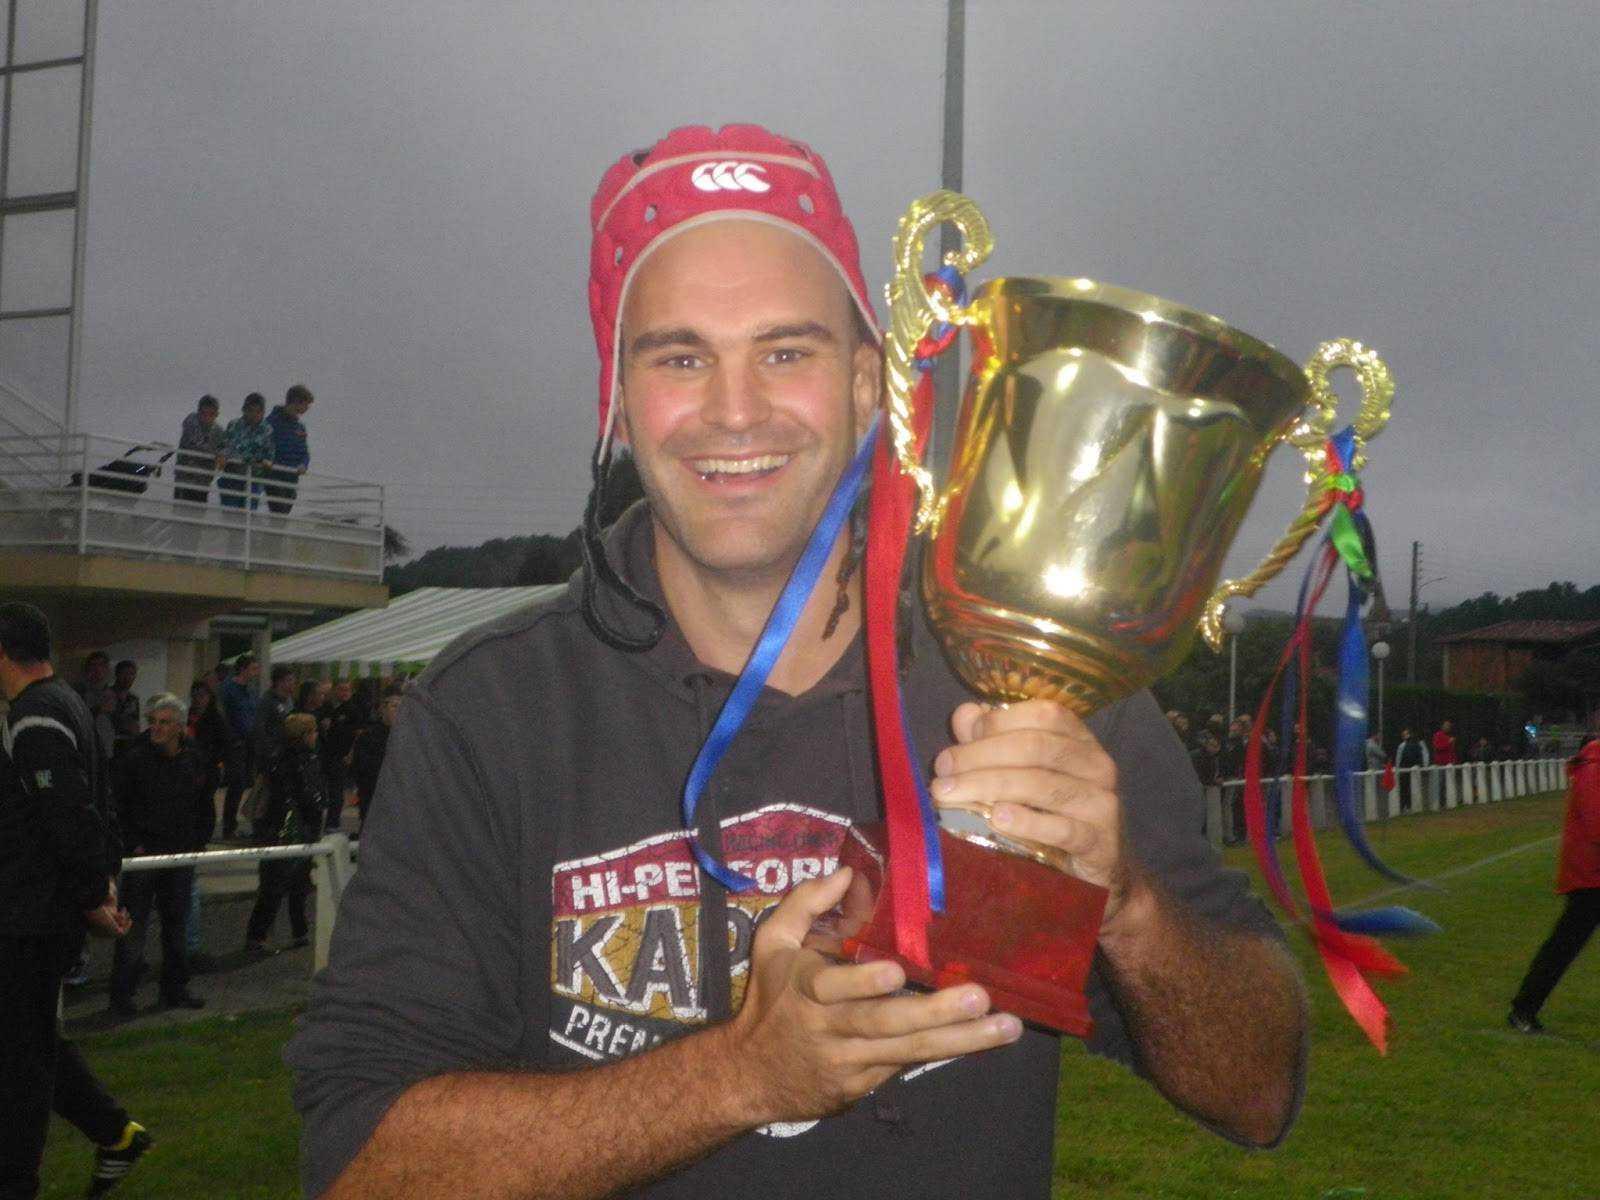 Francois montauriol